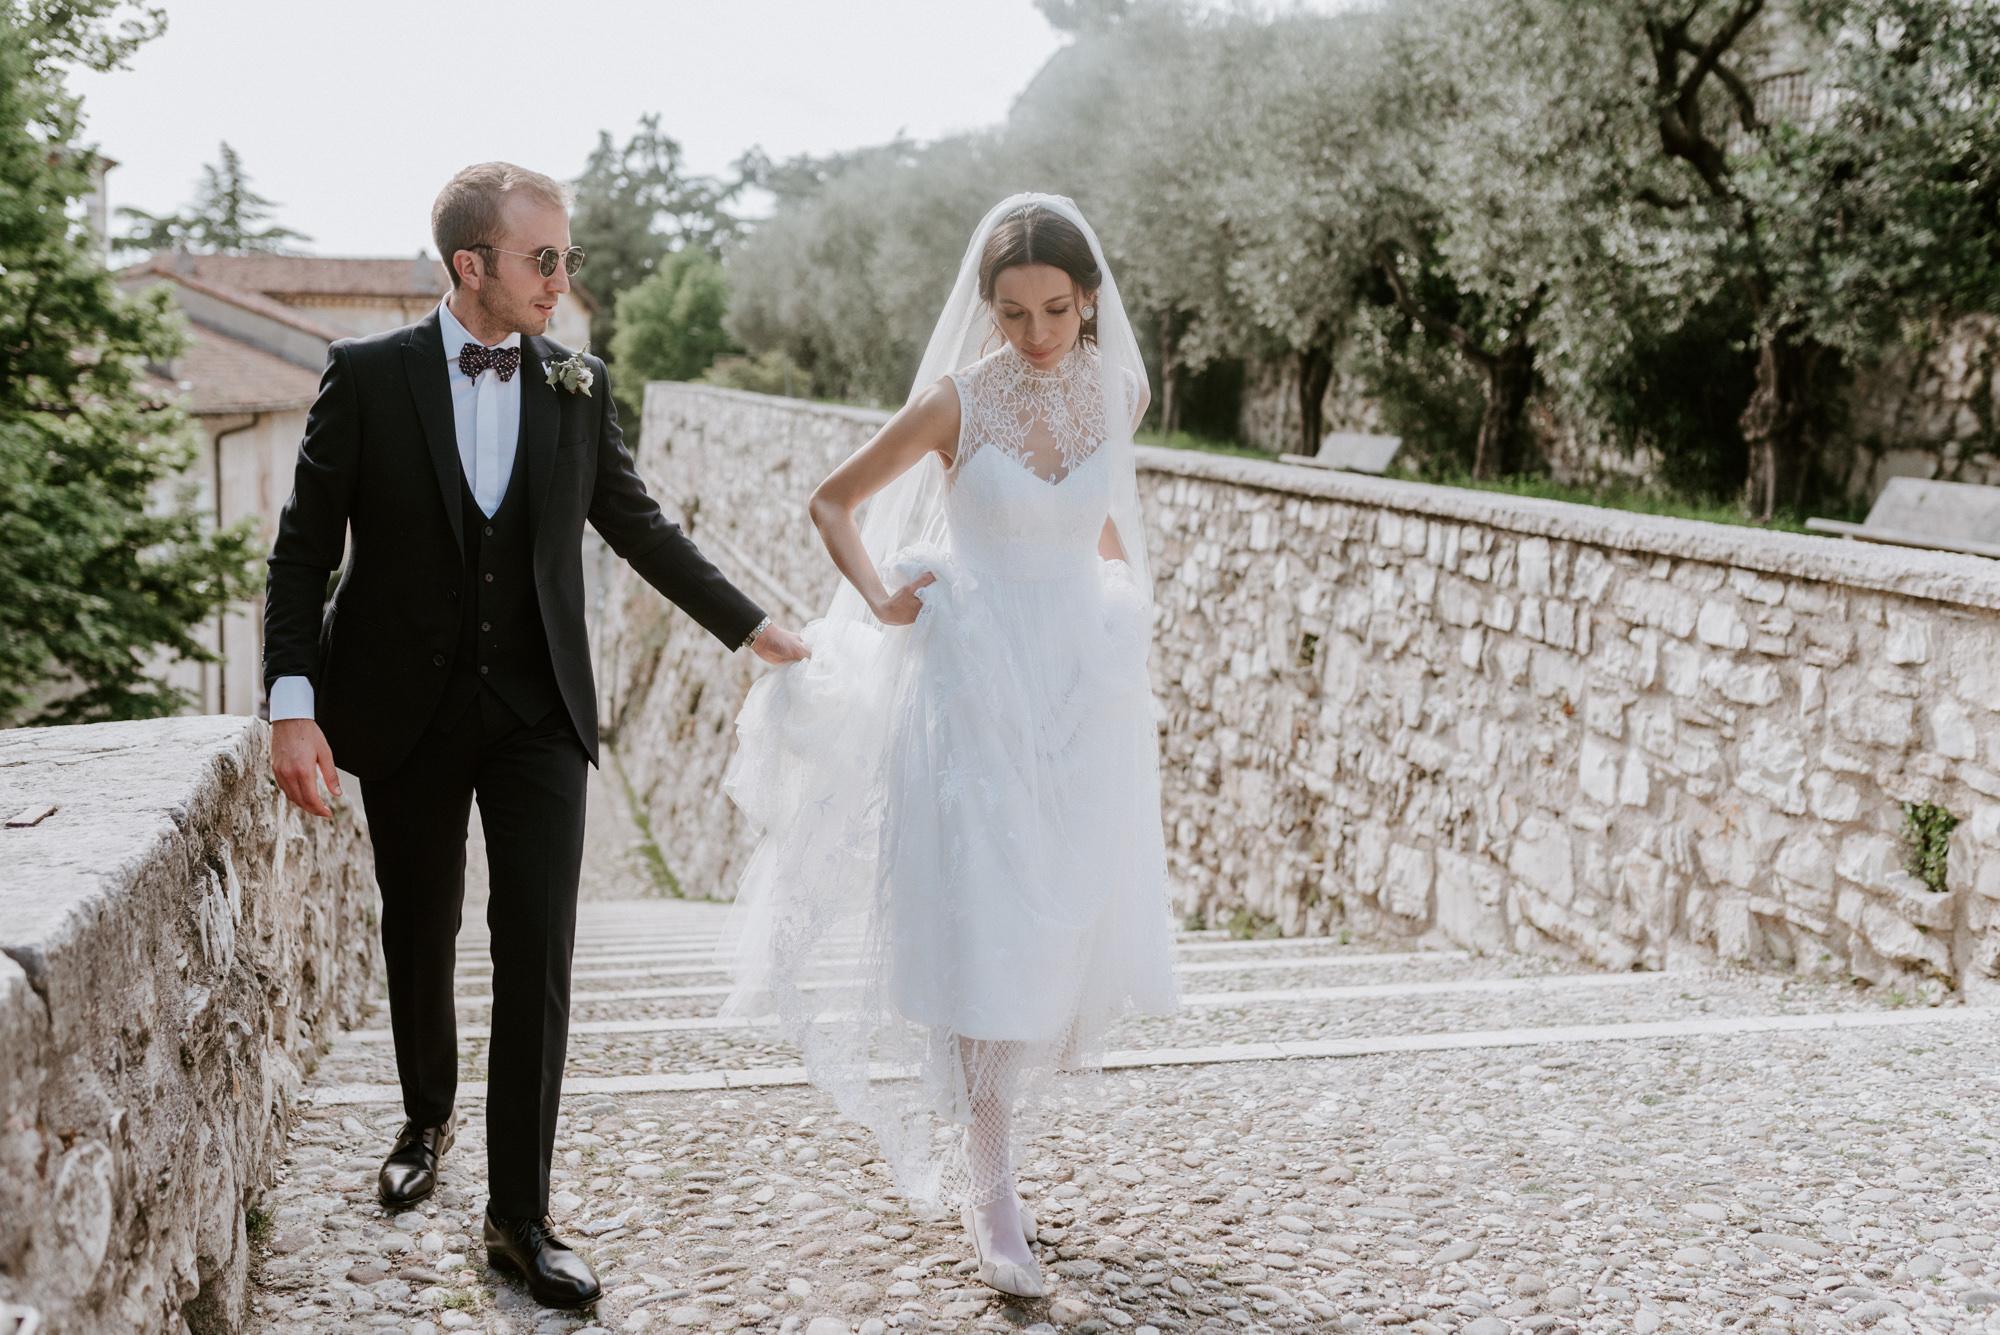 FOTO+PHOTO+BODA+WEDDING+ITALIA+ITALY+MAURICIO+GARAY+MAURICIOGARAY+WEDDINPHOTOGRAPHER+FOTOGRAFODEBODA-1173.jpg